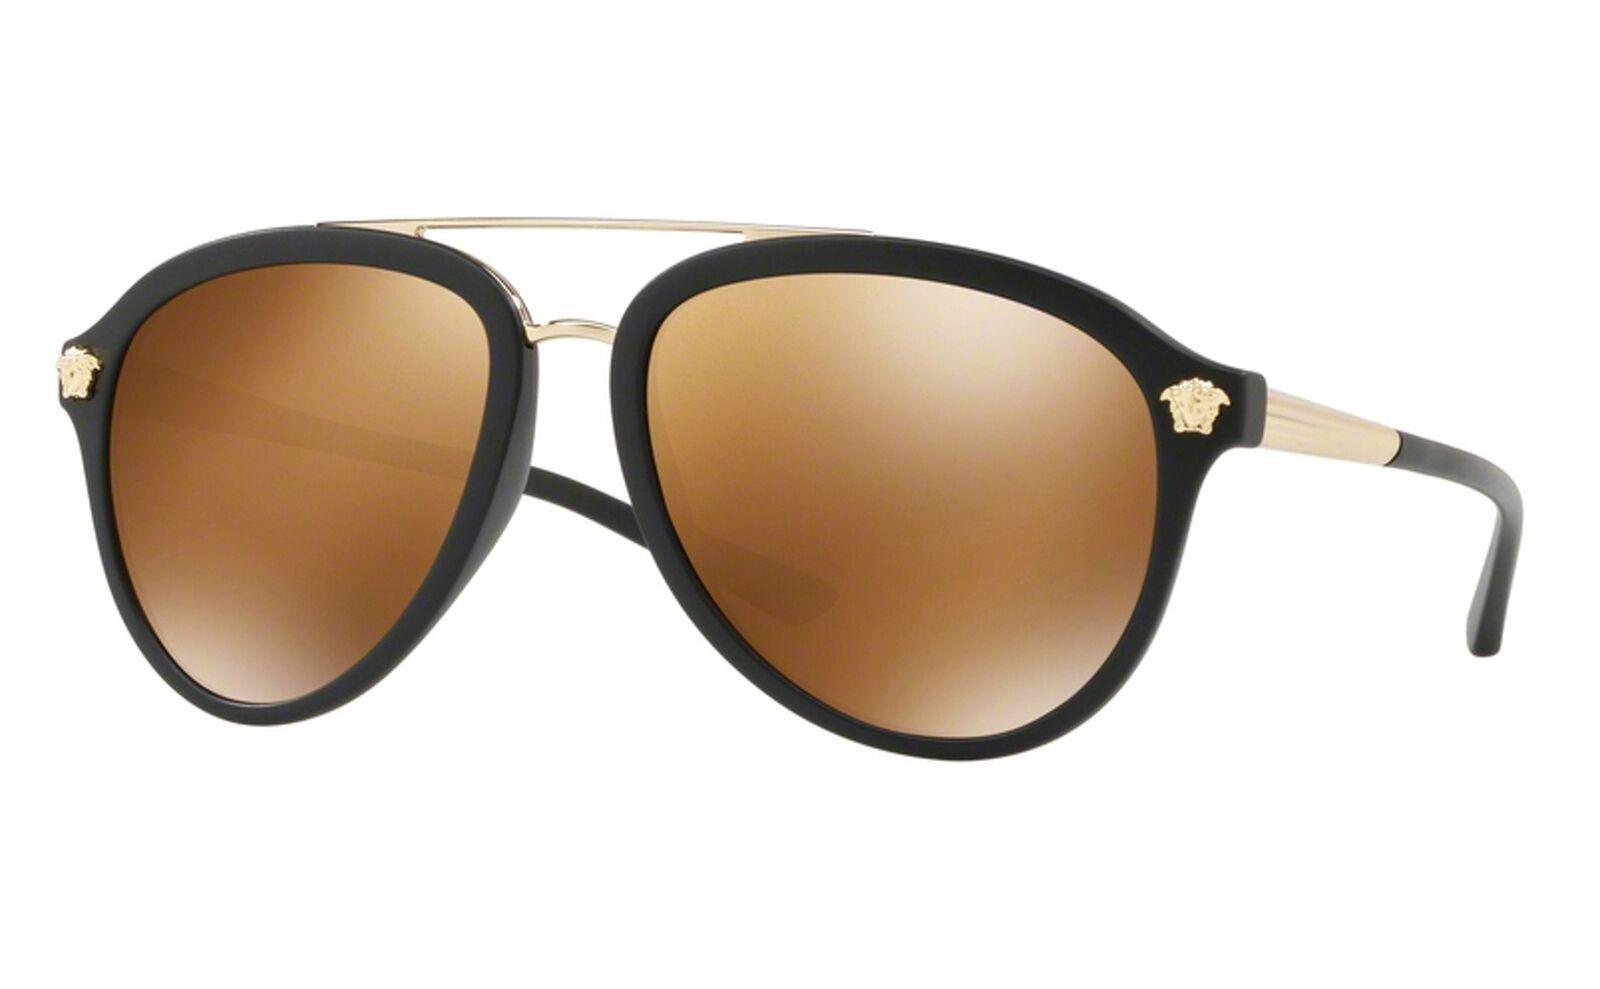 NEW Versace sunglasses VE2212 10027P 57mm Gold Gold Mirror AUTHENTIC Aviator NIB